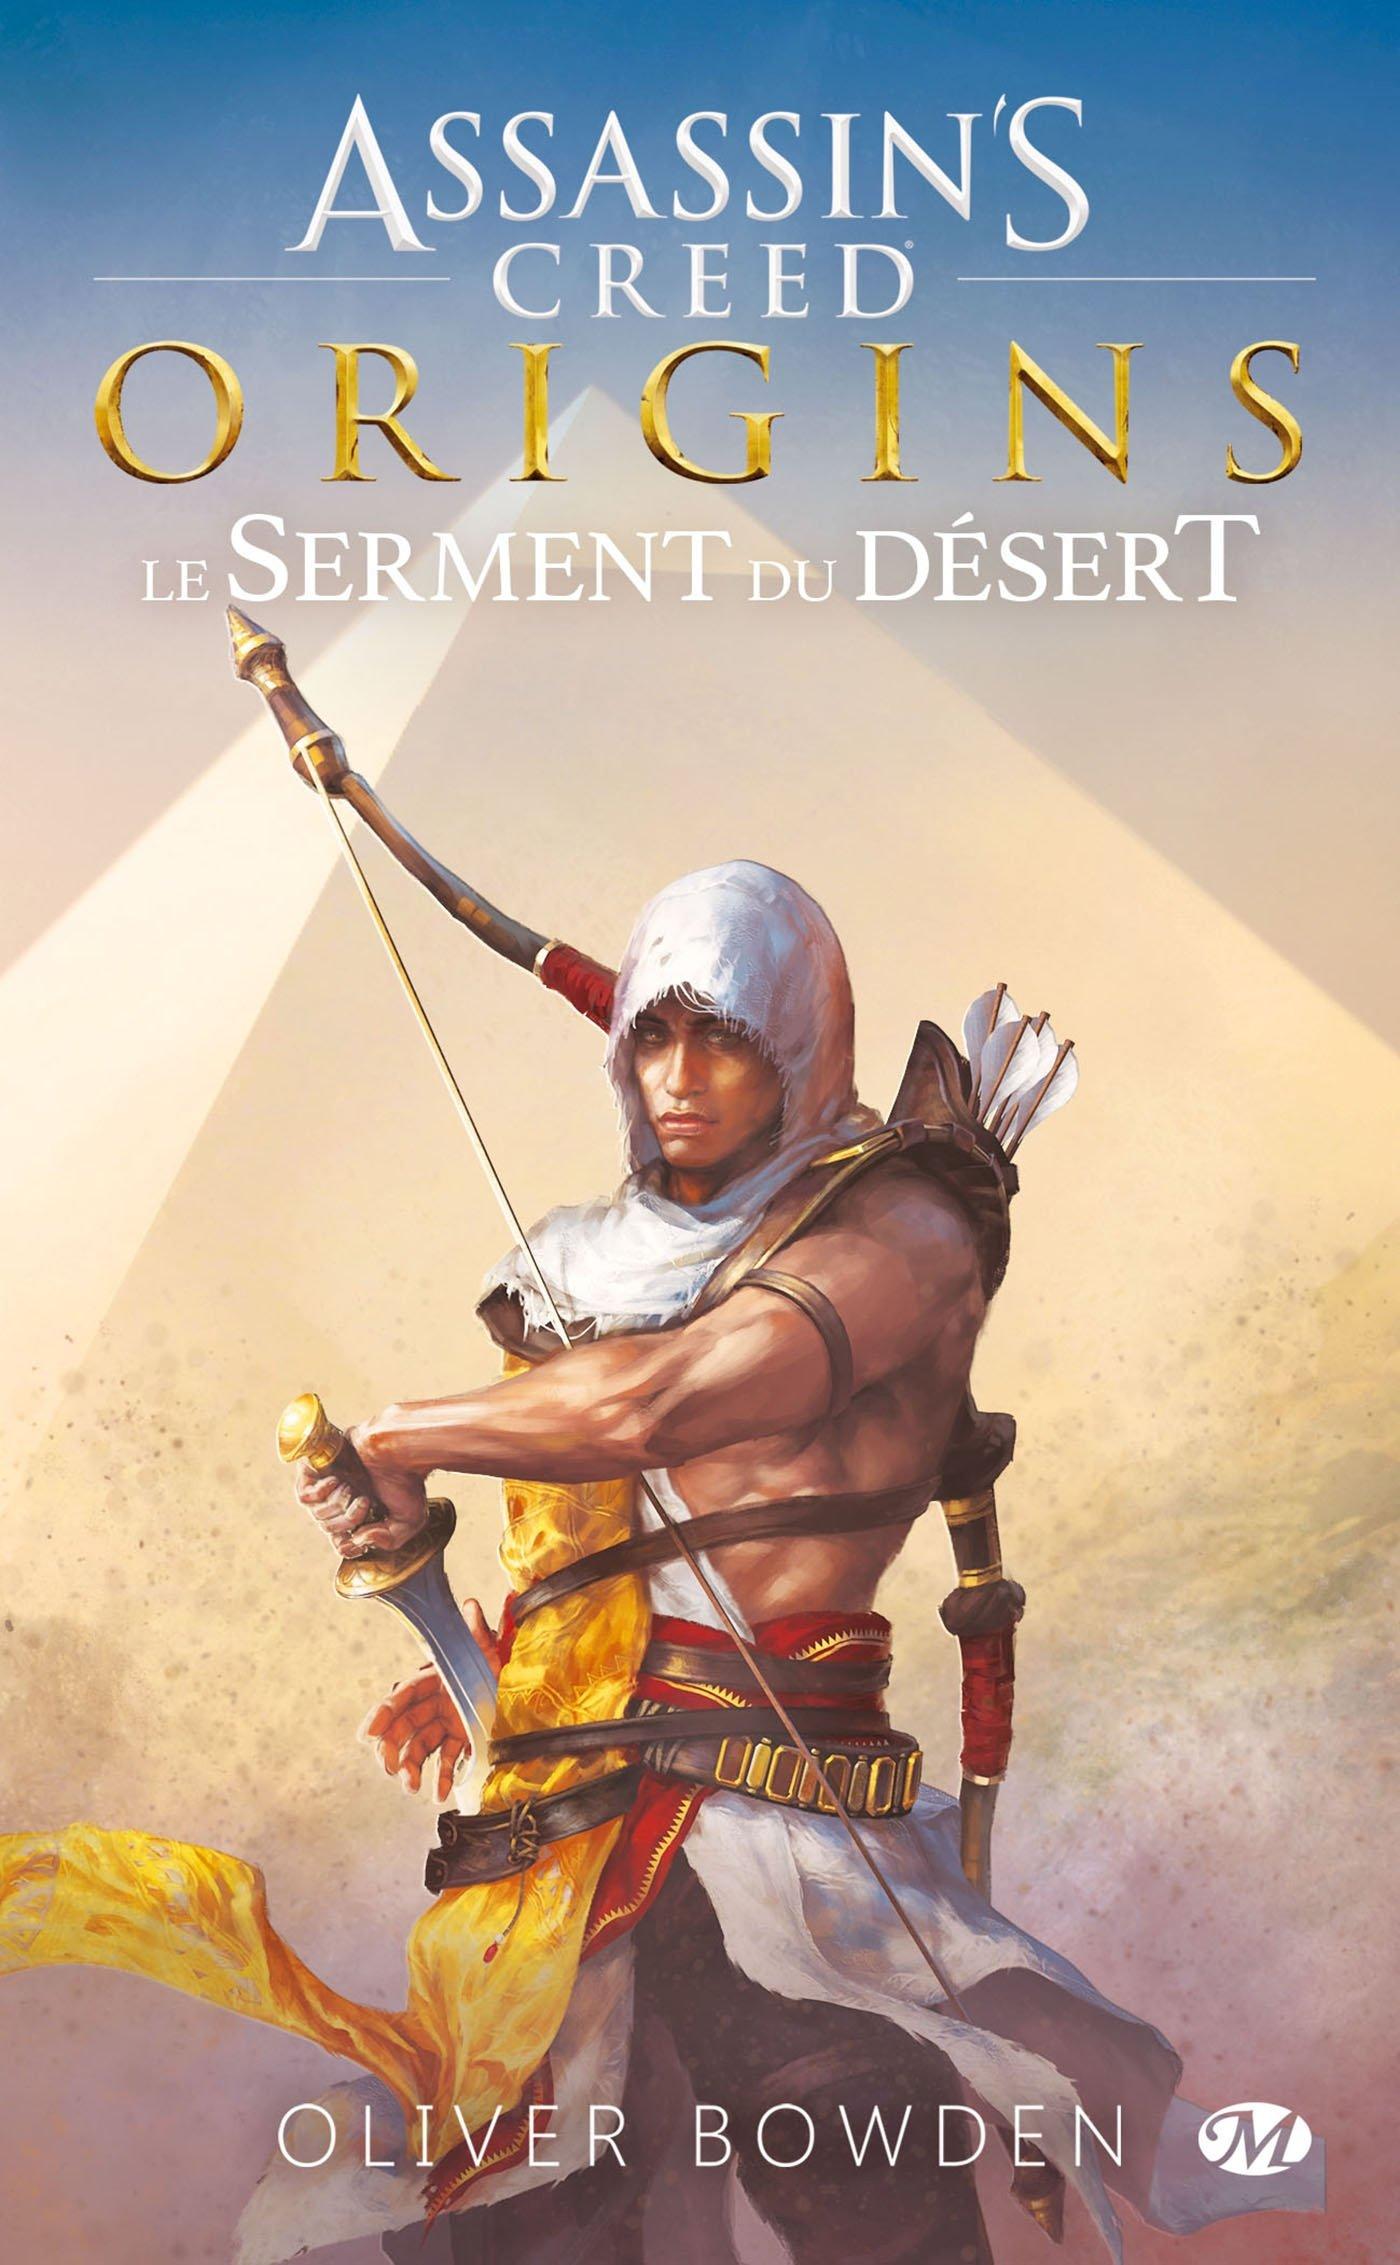 Assassin's Creed : Assassin's Creed Origins: Le serment du désert Poche – 27 octobre 2017 Oliver Bowden Bragelonne 2811225498 Fantasy